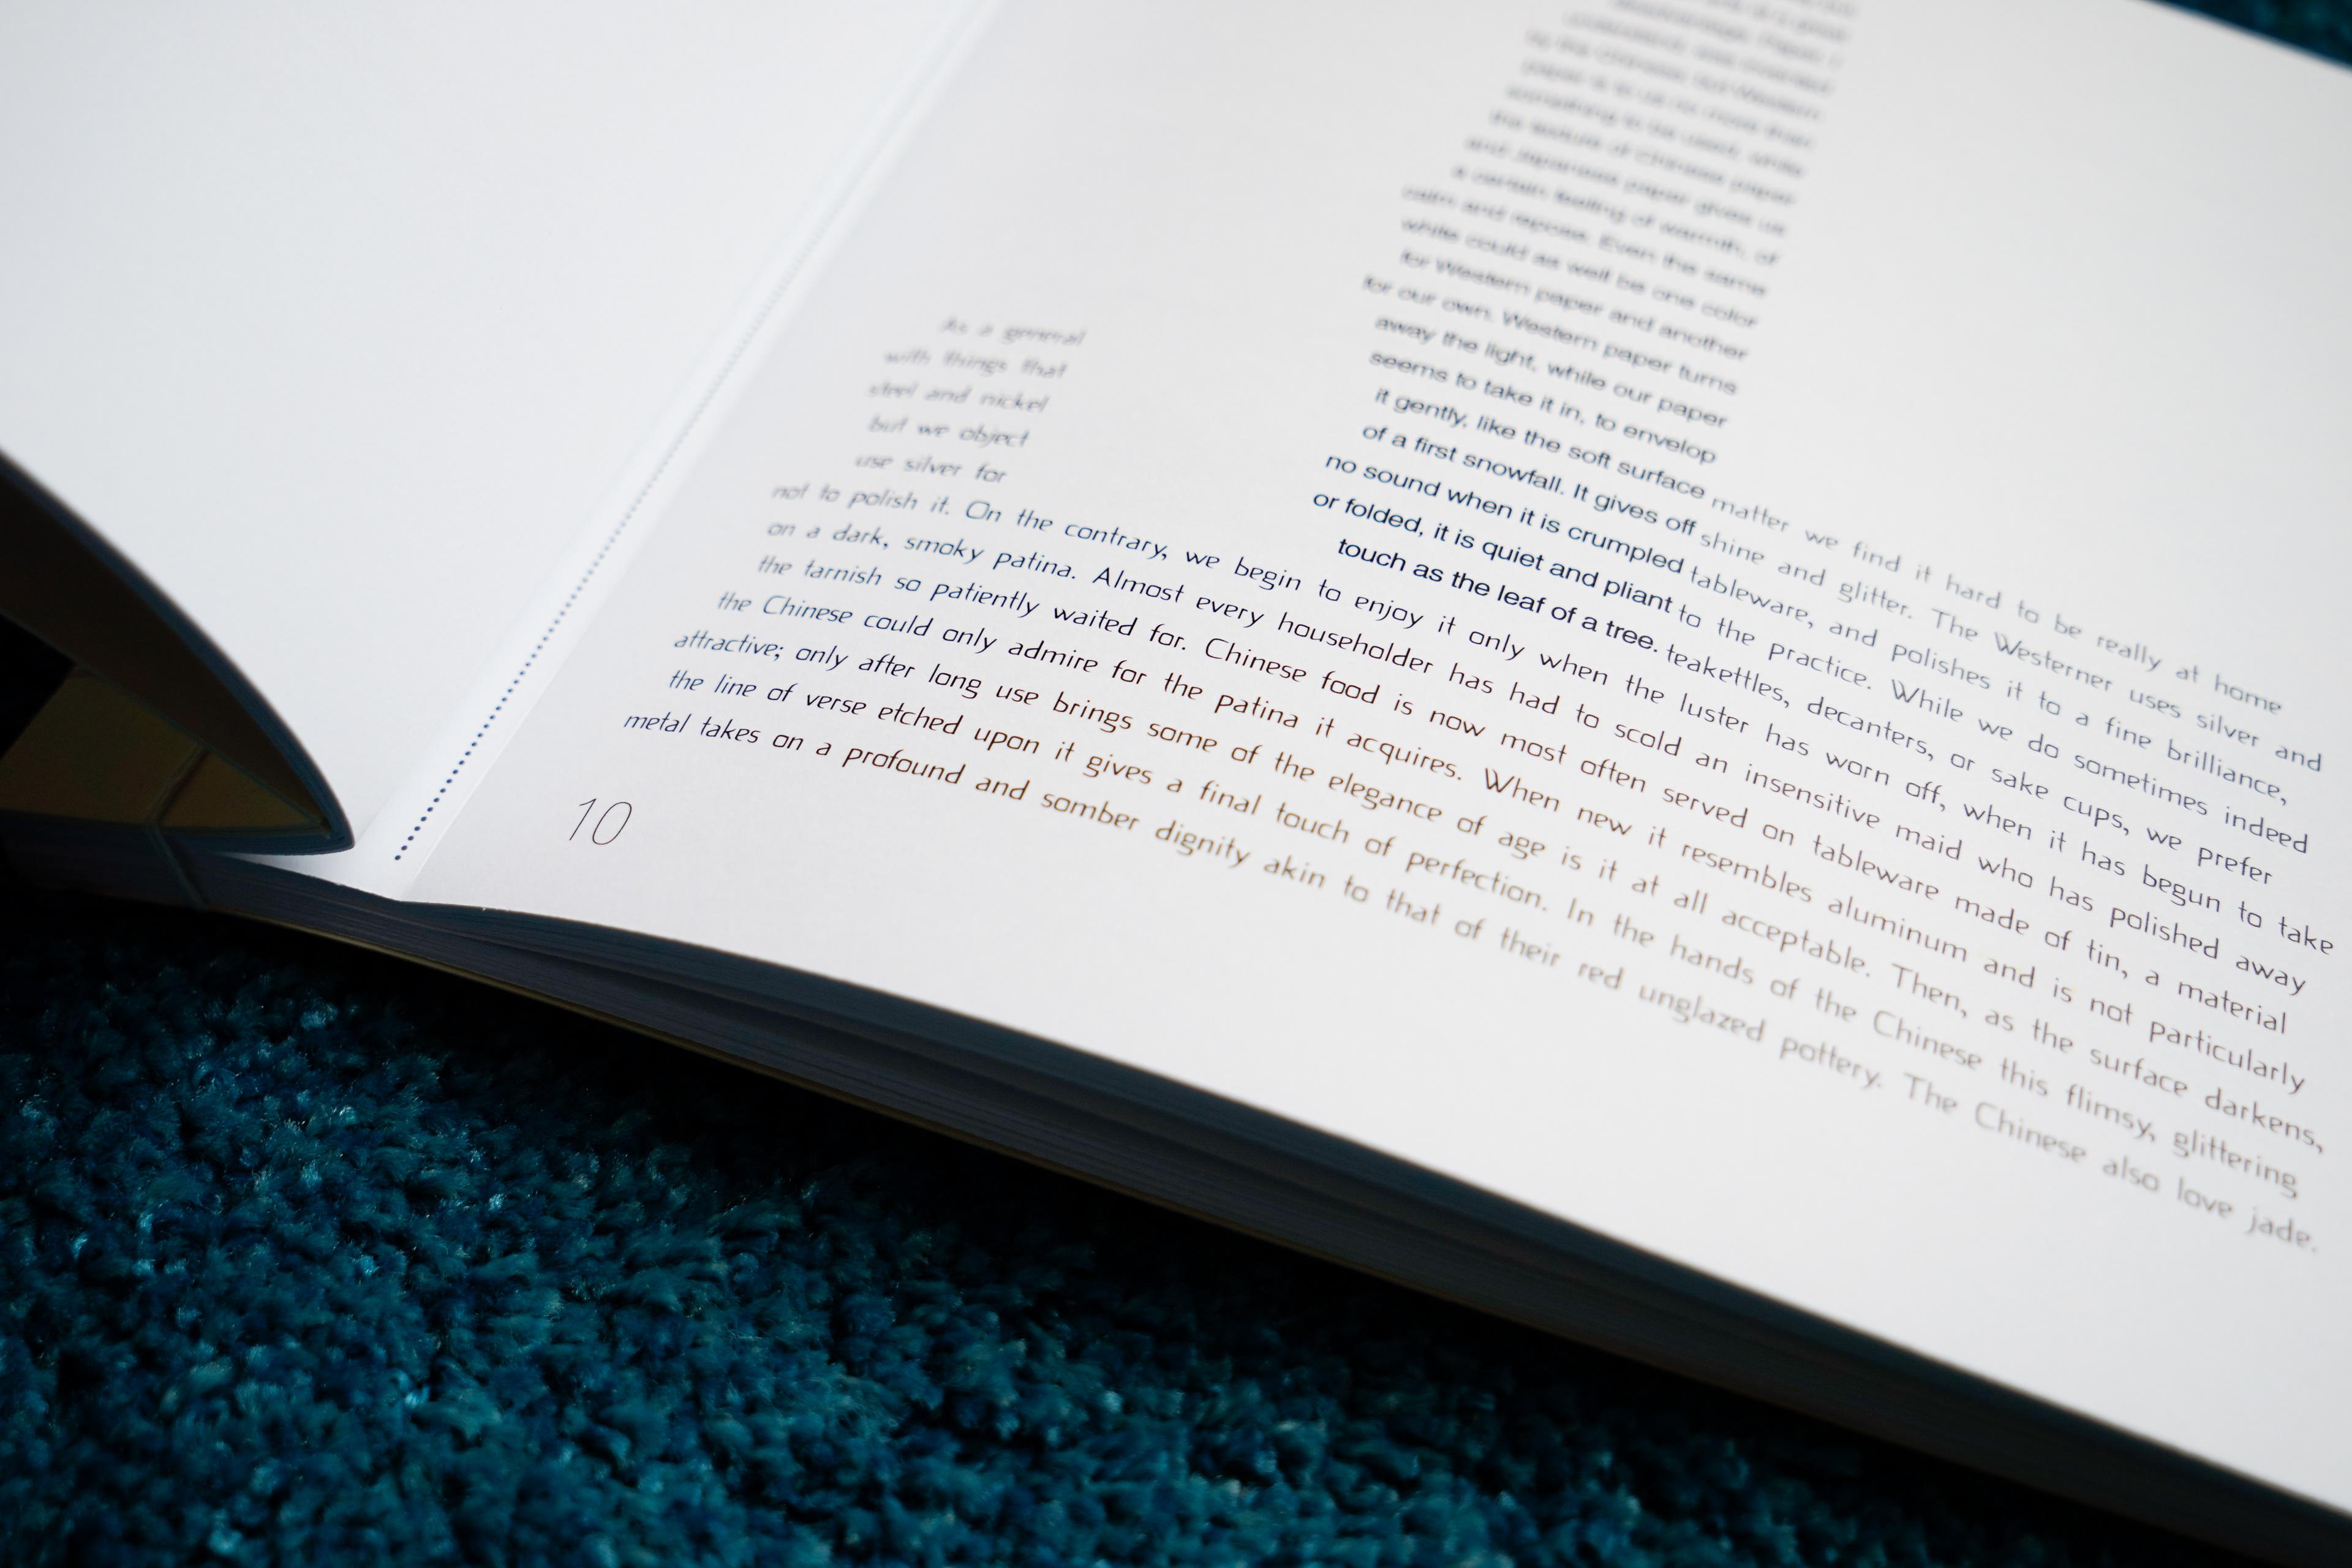 junichiro tanizaki in praise of shadows pdf